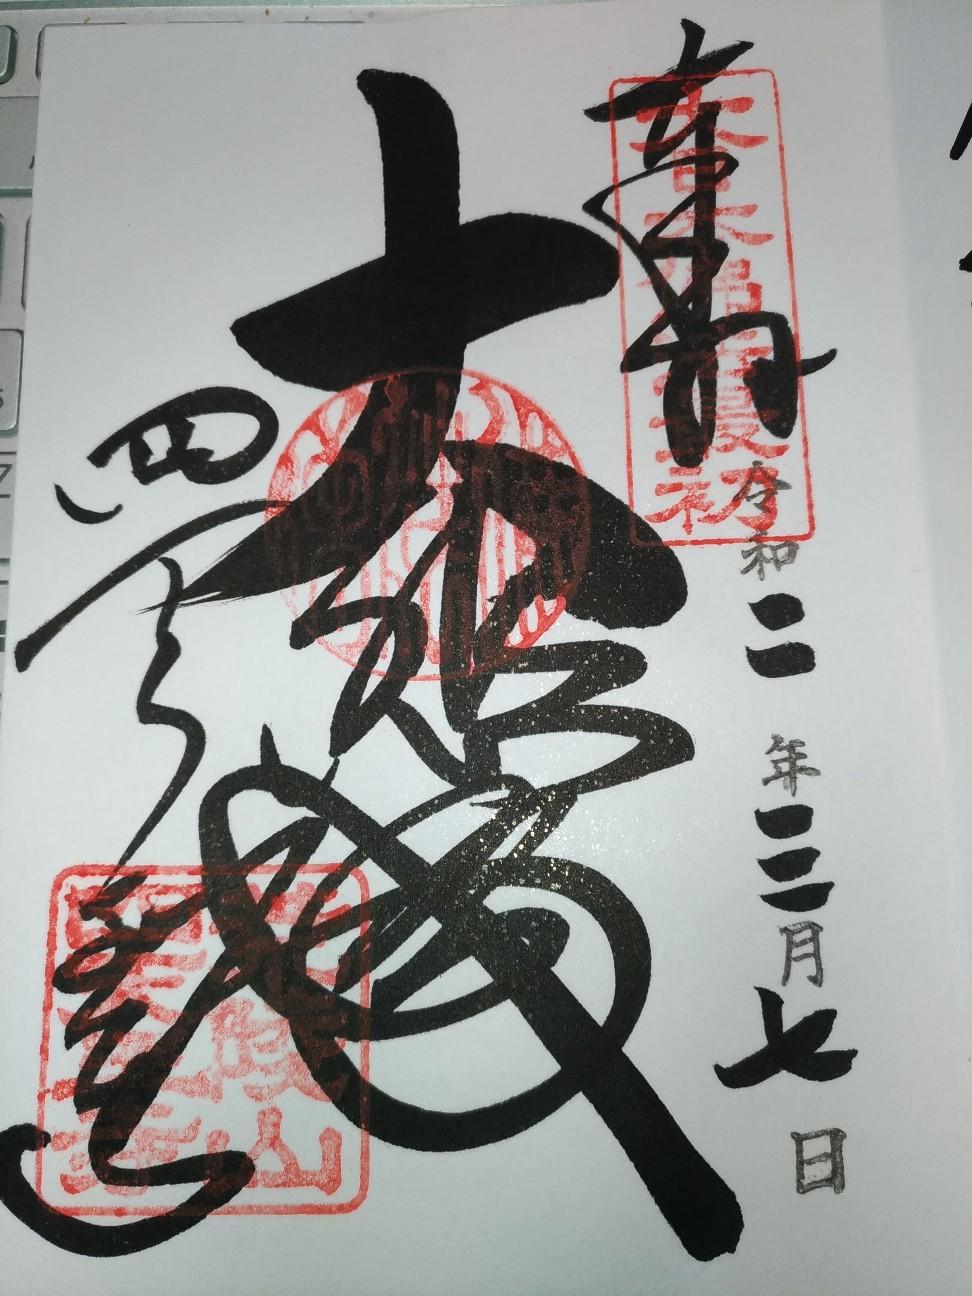 f:id:HKT1989:20200309071252j:image